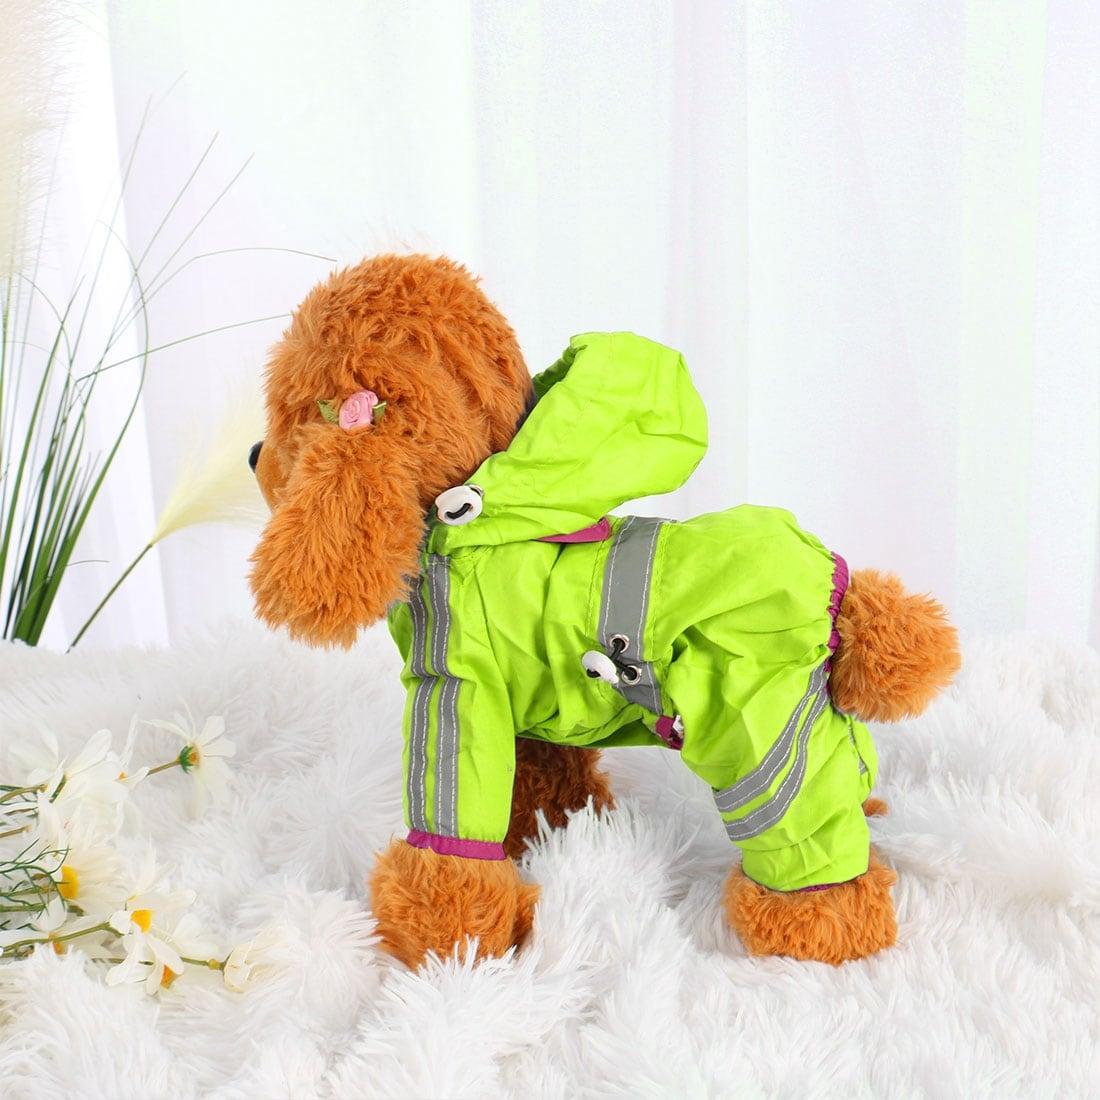 Pet Dog Raincoat Rain Jacket Poncho Clothes Polyester Puppy Water-resistant (Fuchsia - XS)